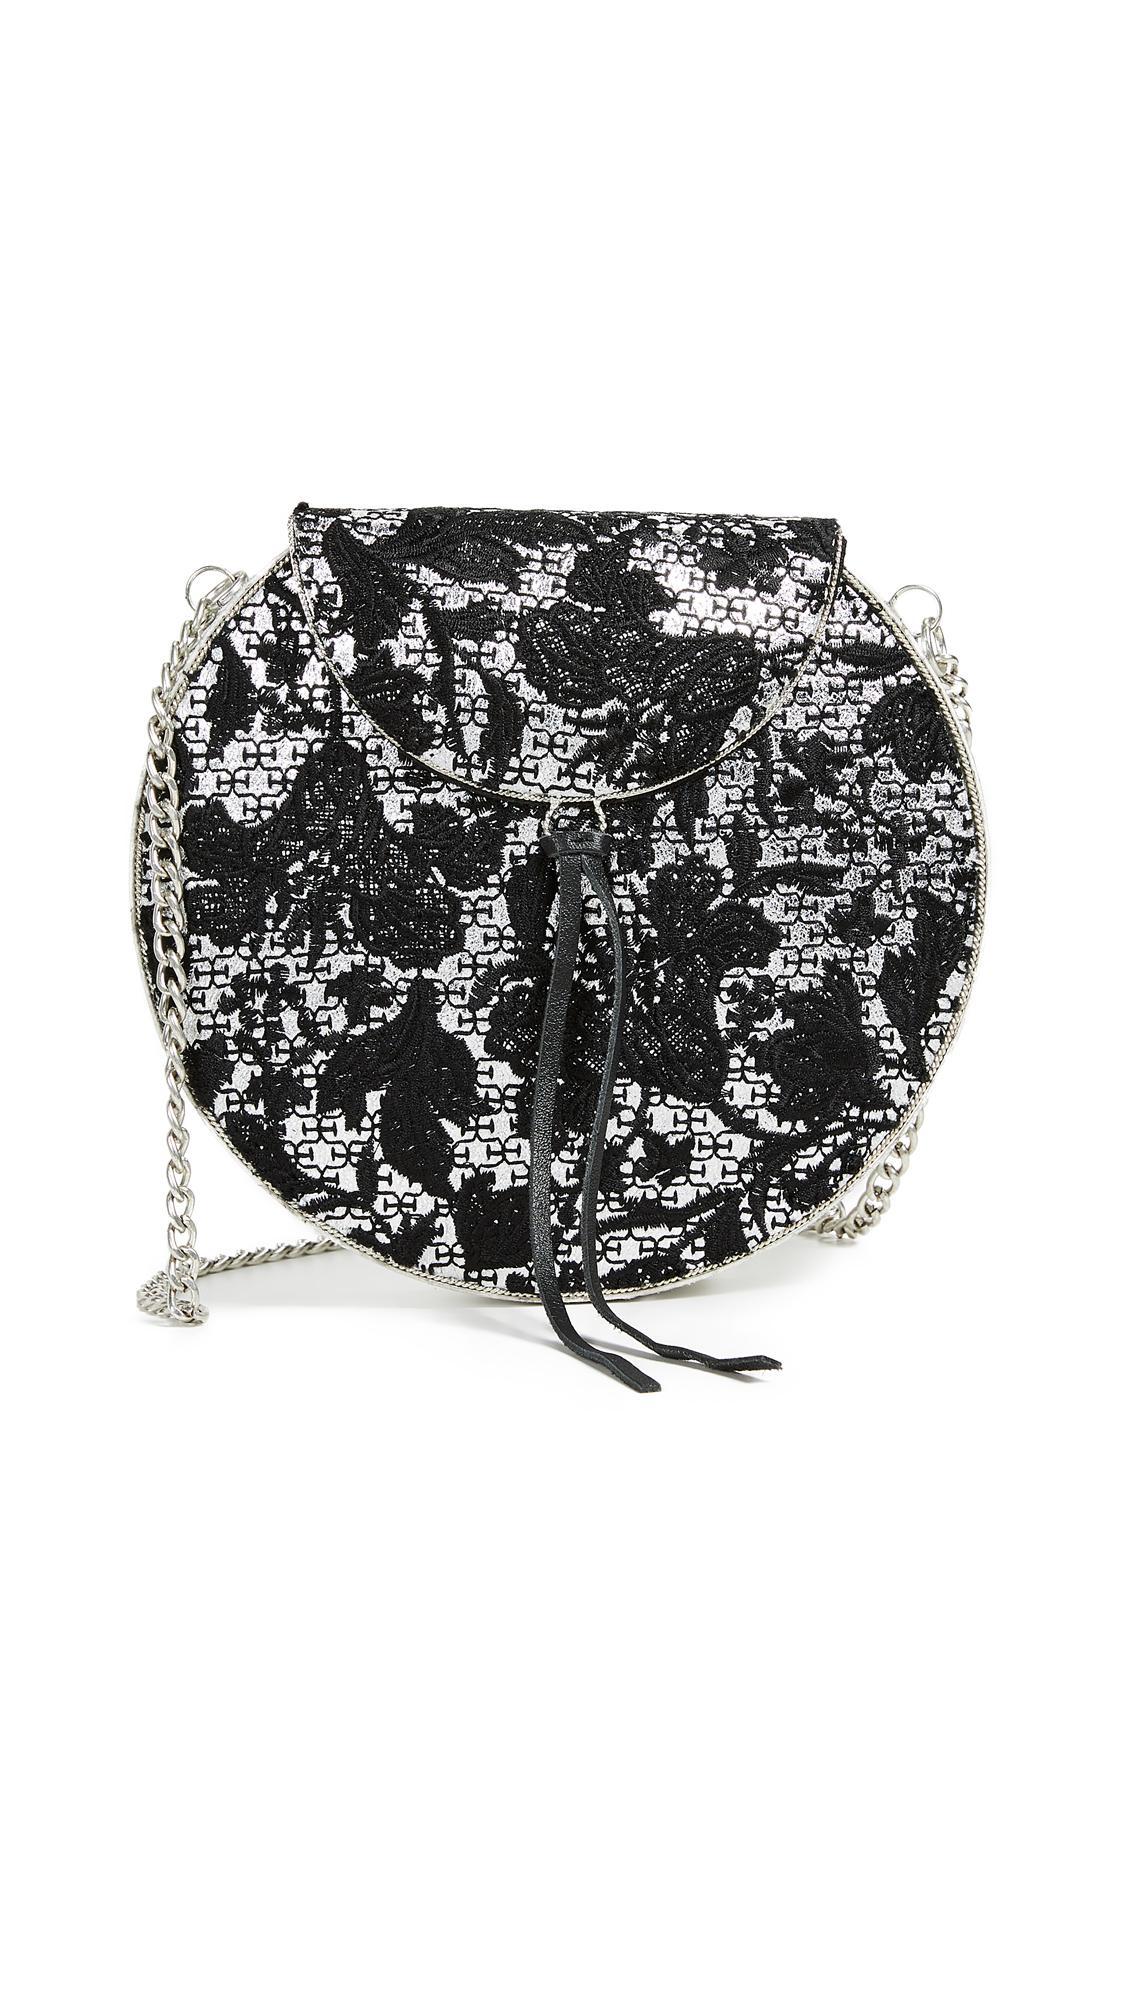 023e3d3121ba Sam Edelman Beatrice Metal Minaudiere In Silver Floral Embroidery ...